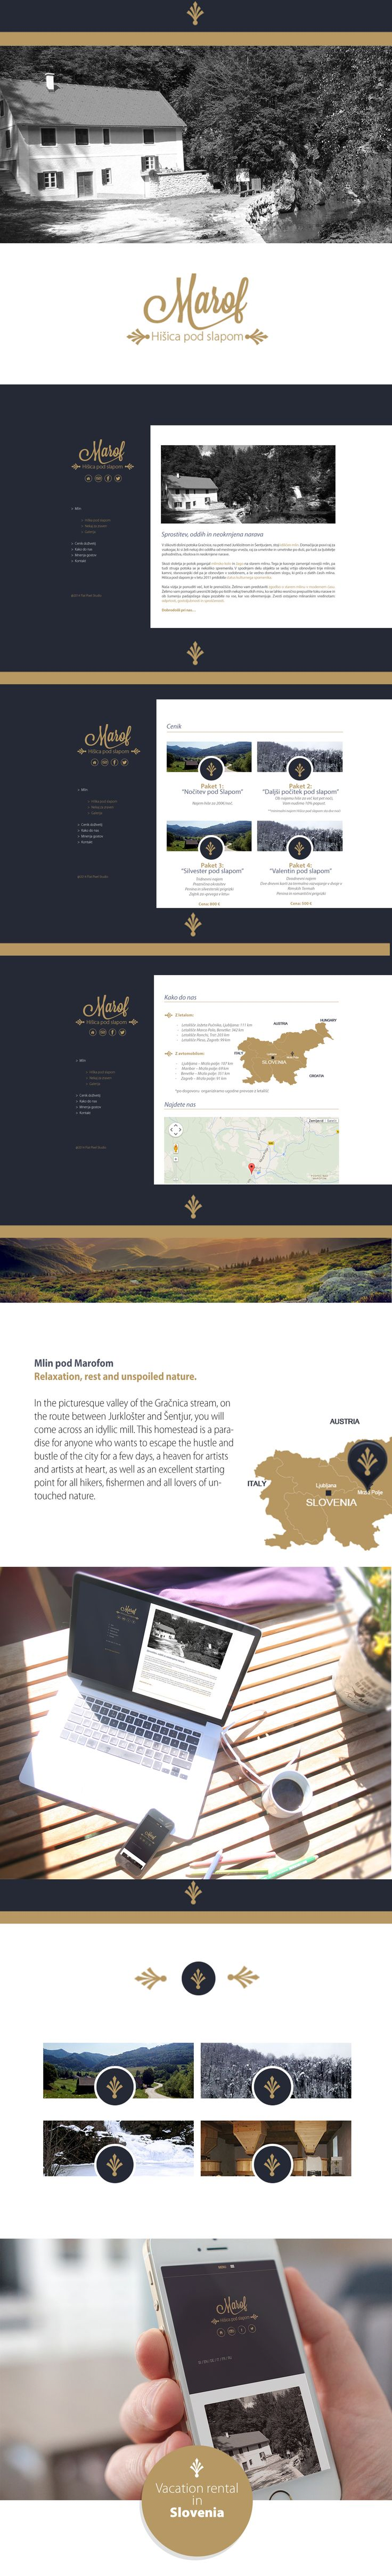 Vacation rental website.